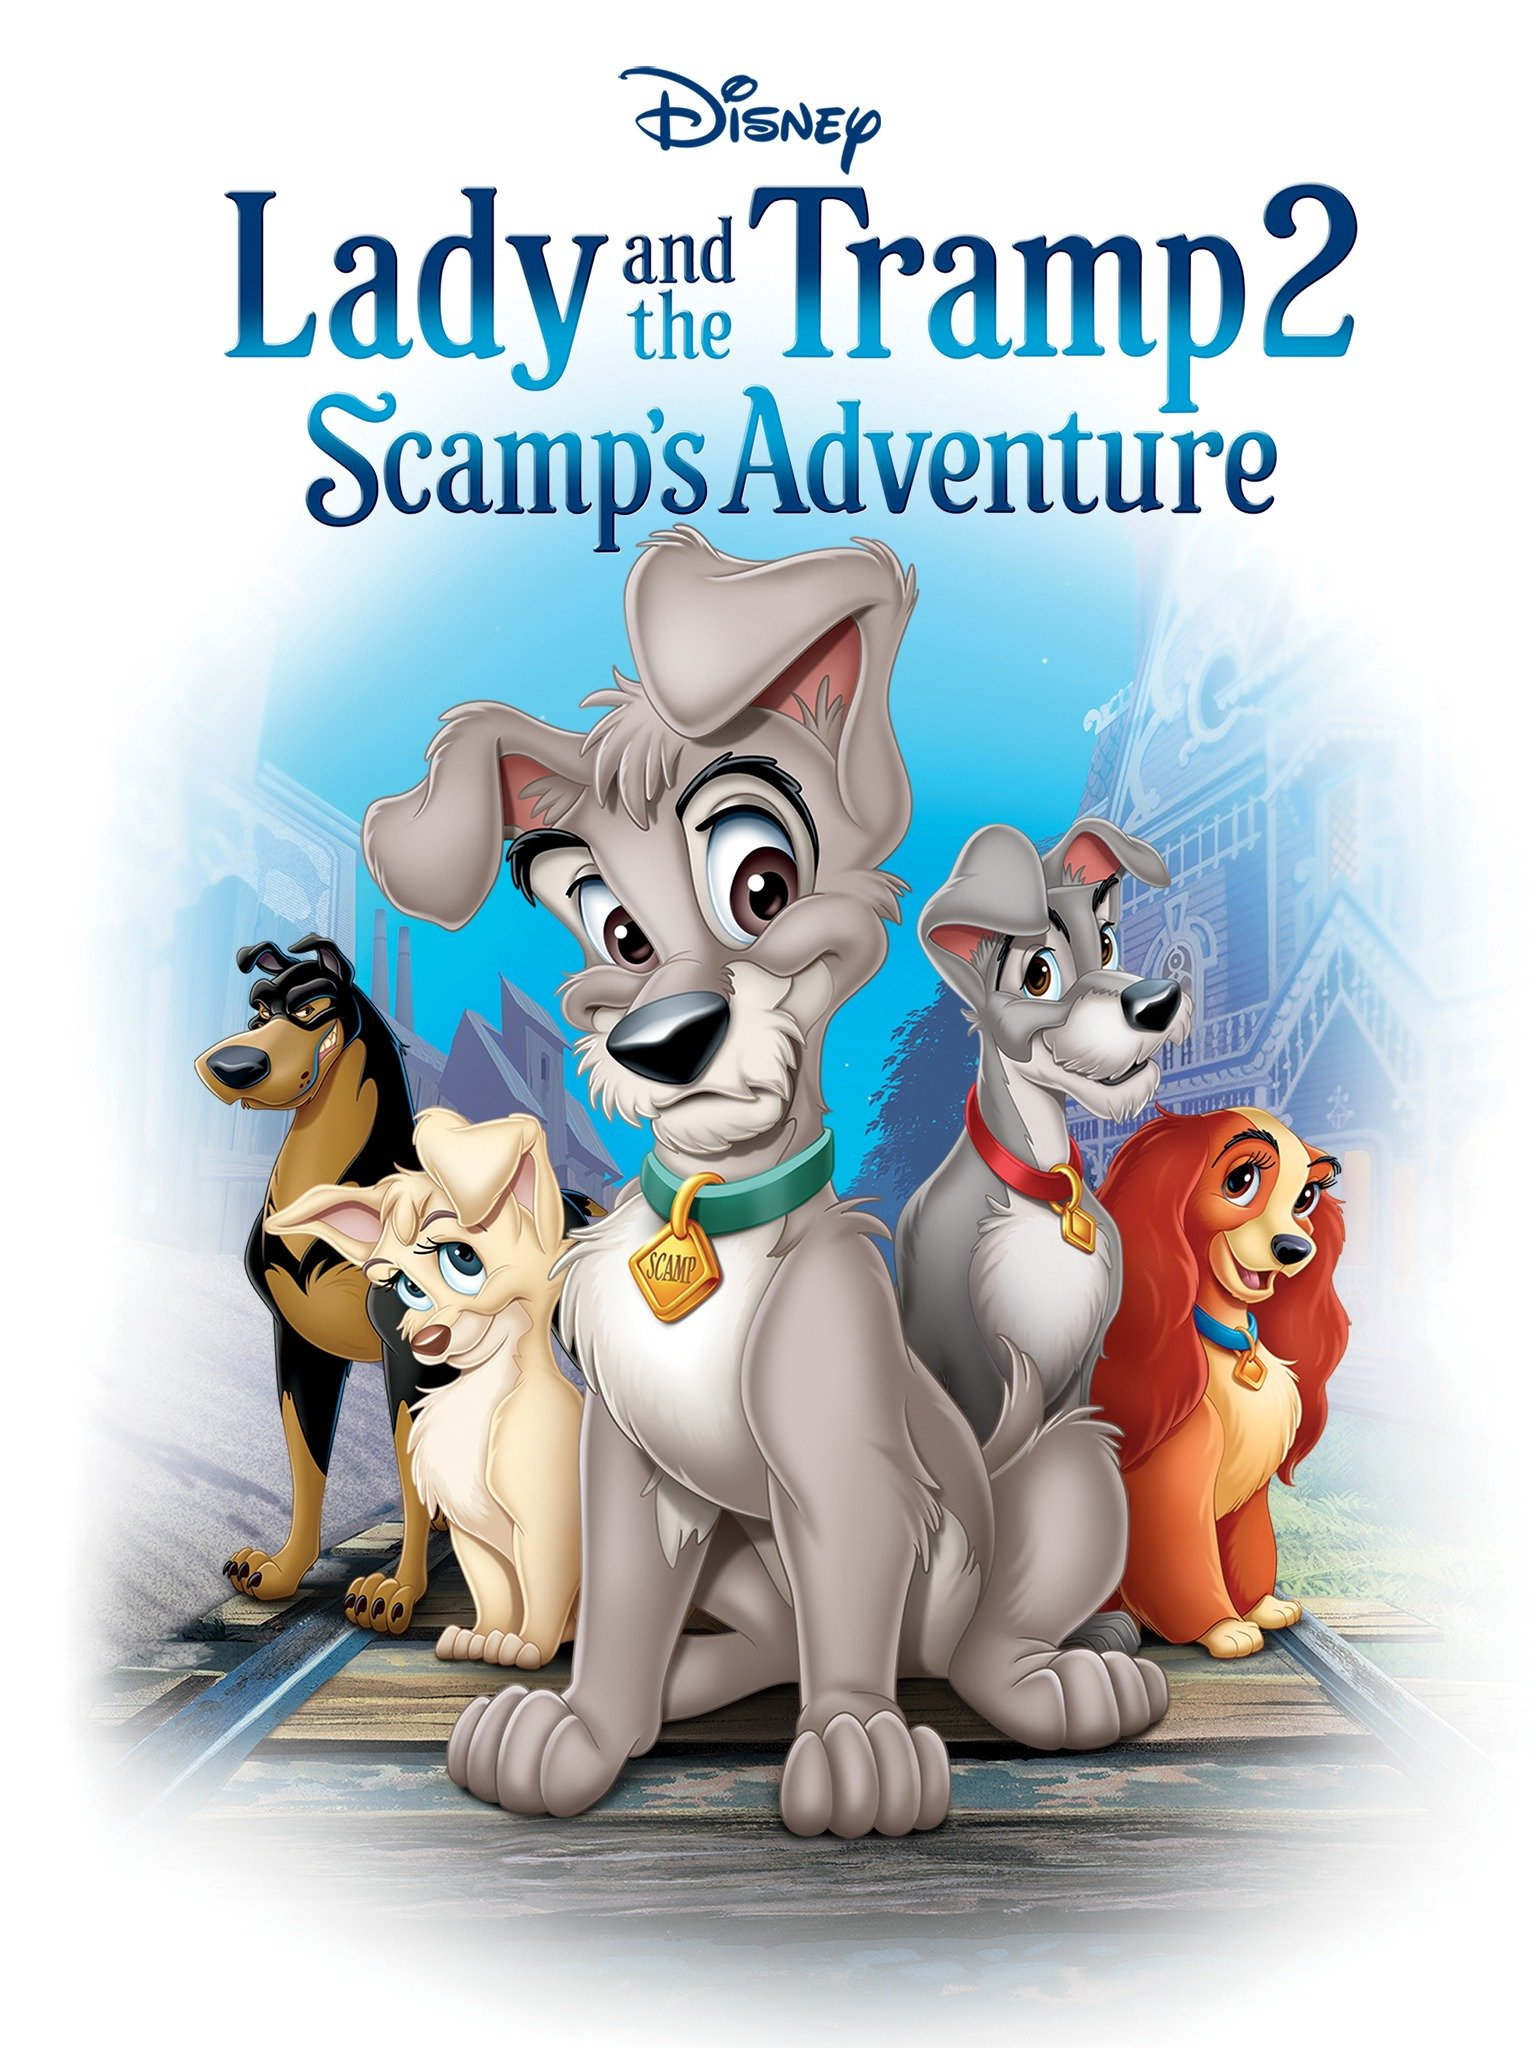 Lady and the Tramp II : ทรามวัยกับไอ้ตูบ 2